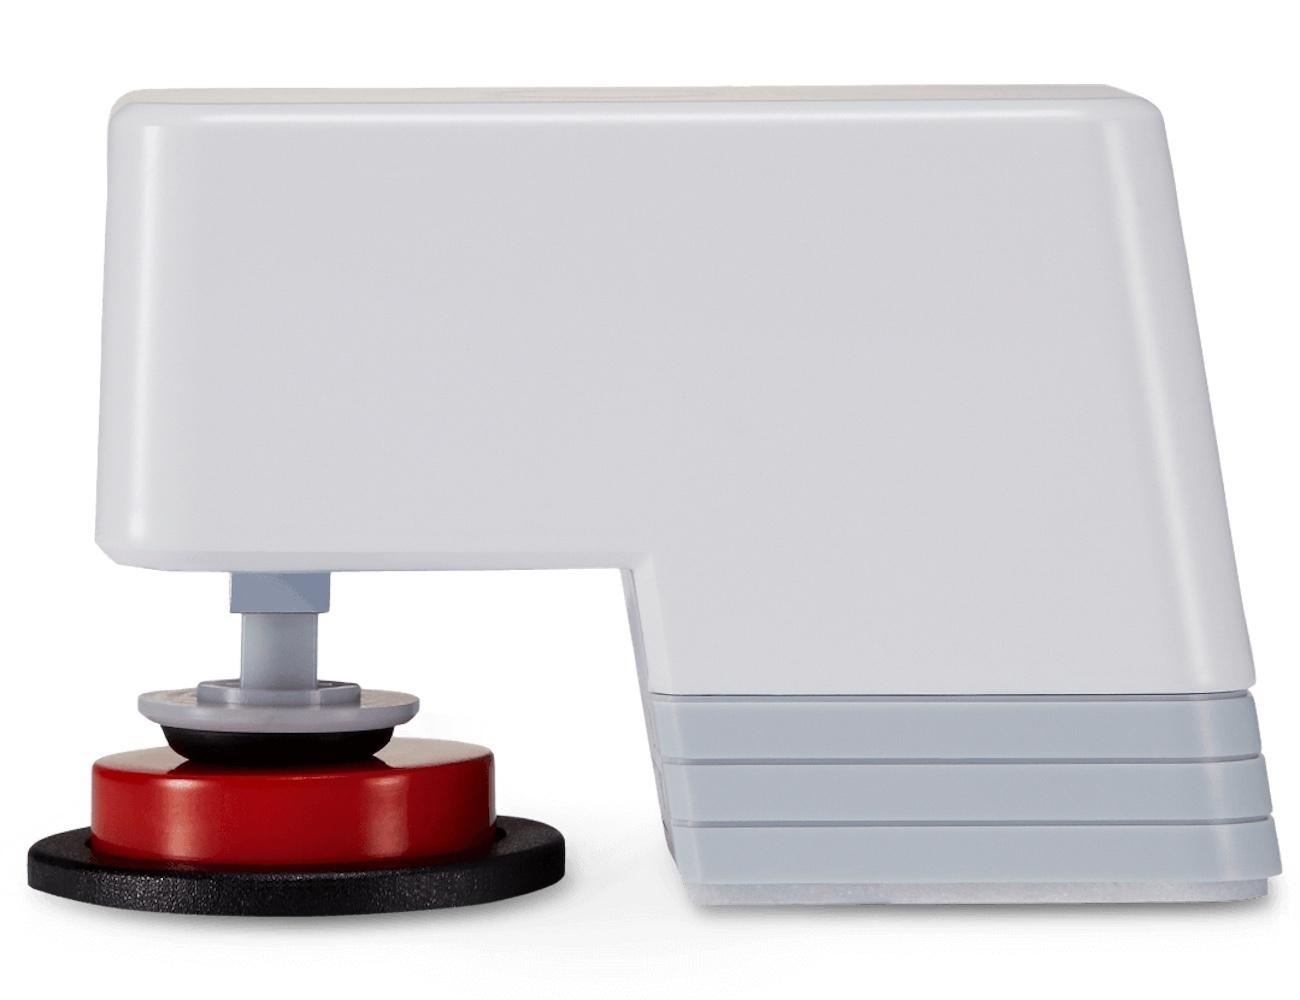 MicroBot Push 2nd Generation Button Pusher